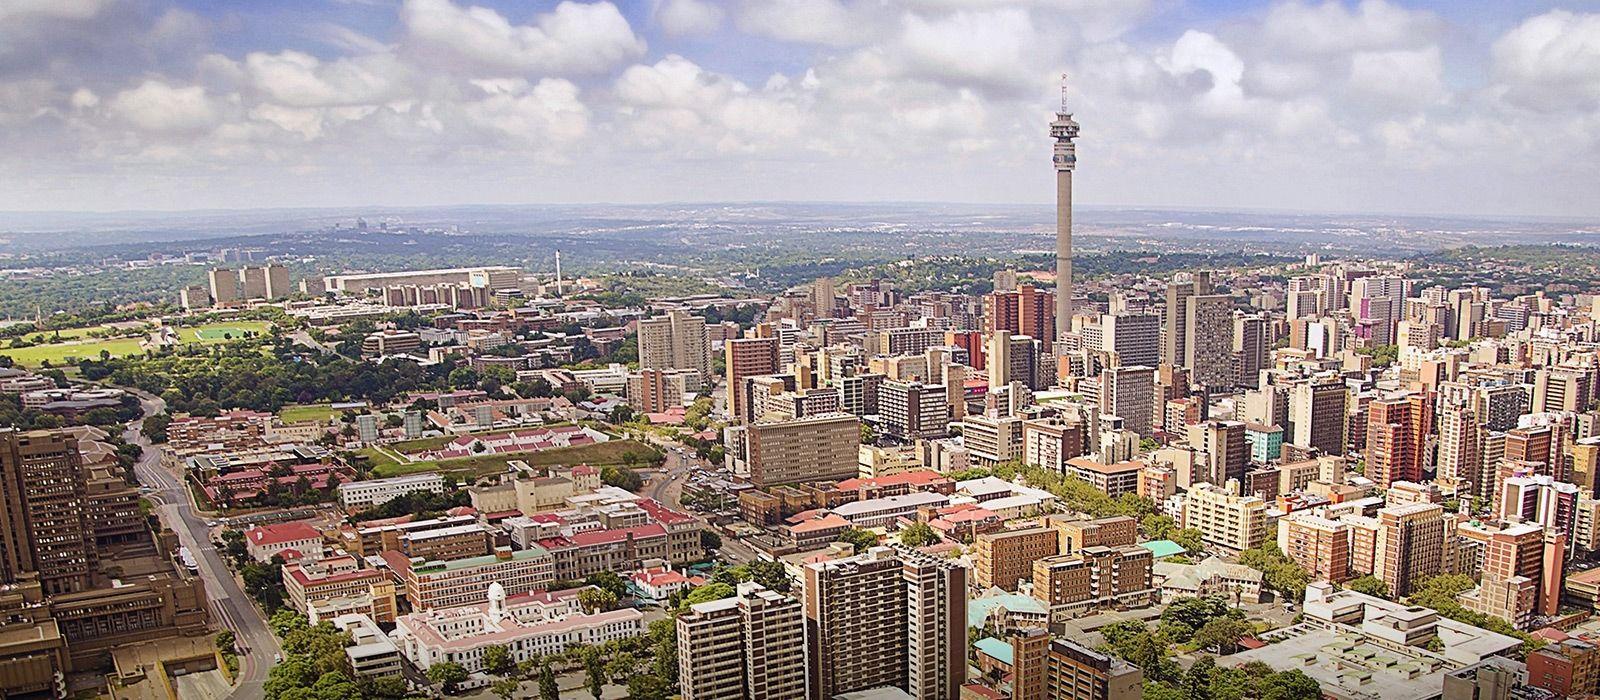 Victoria Falls & Botswana Highlights Tour Trip 1